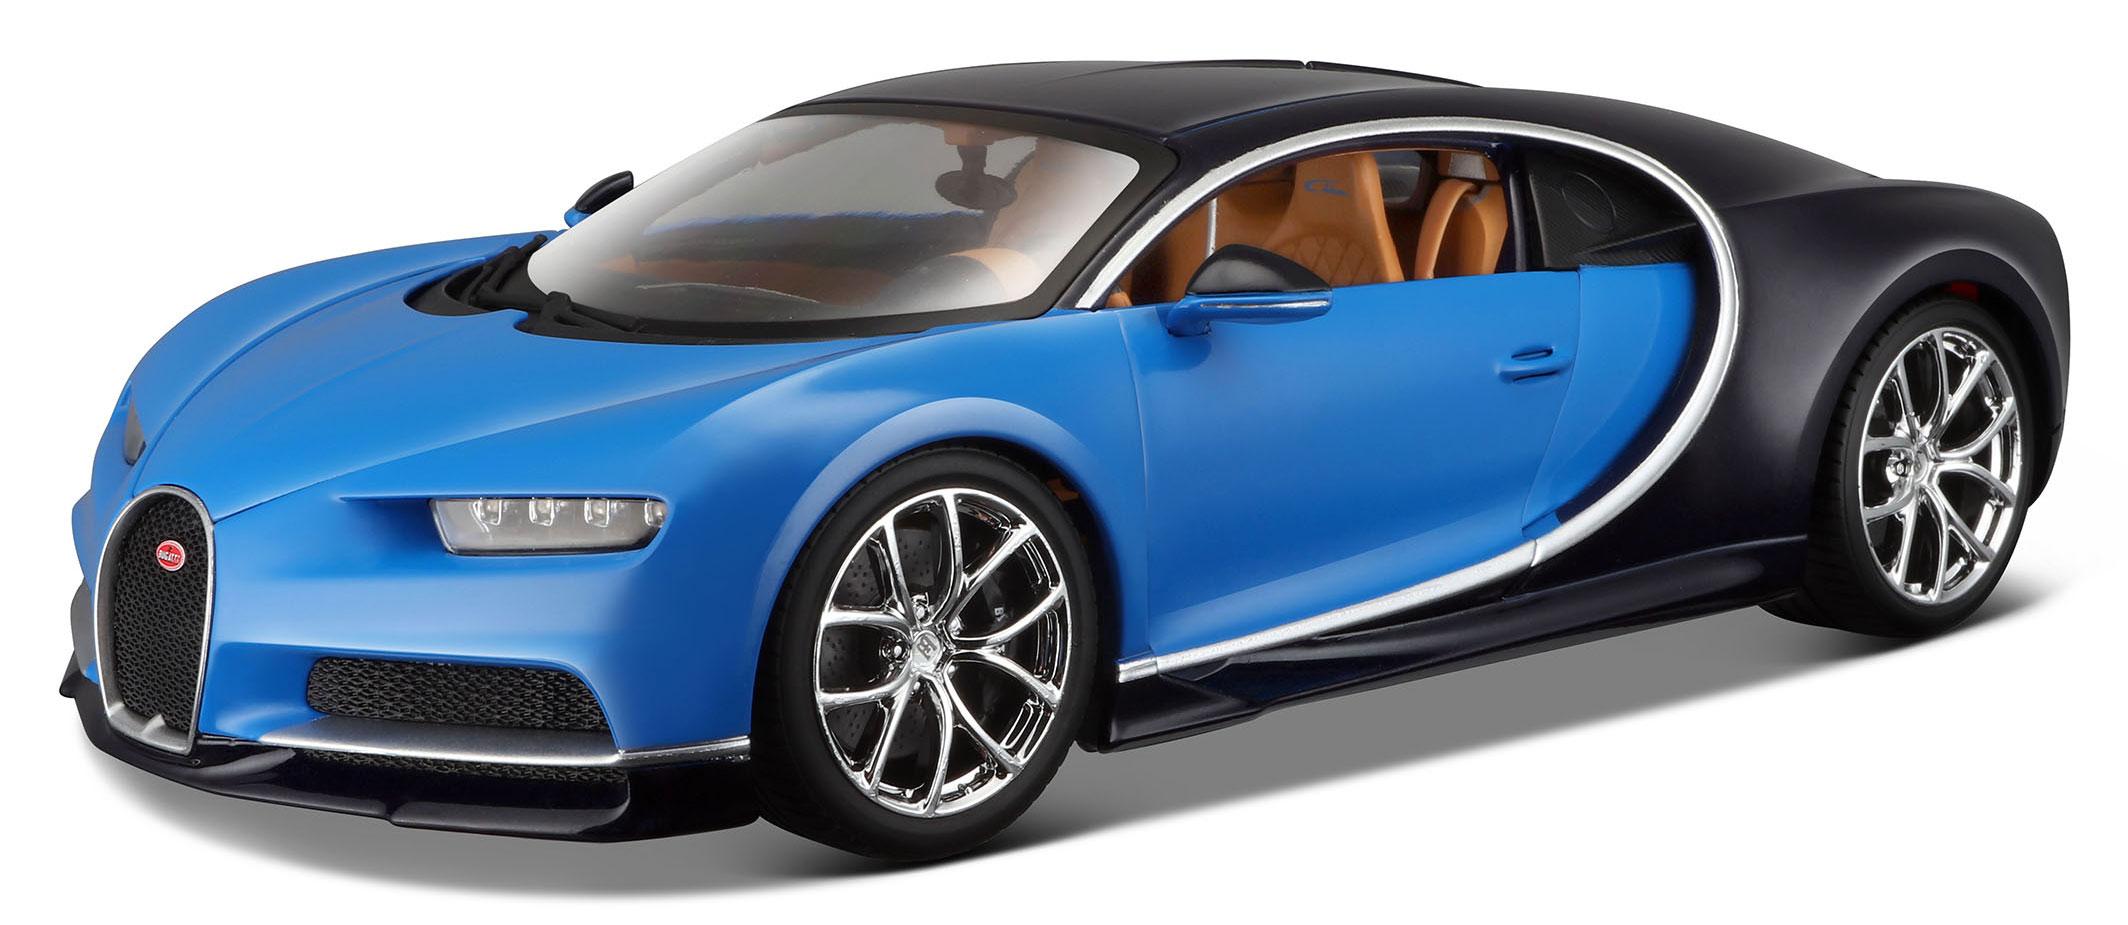 1 18 bugatti chiron blue black. Black Bedroom Furniture Sets. Home Design Ideas